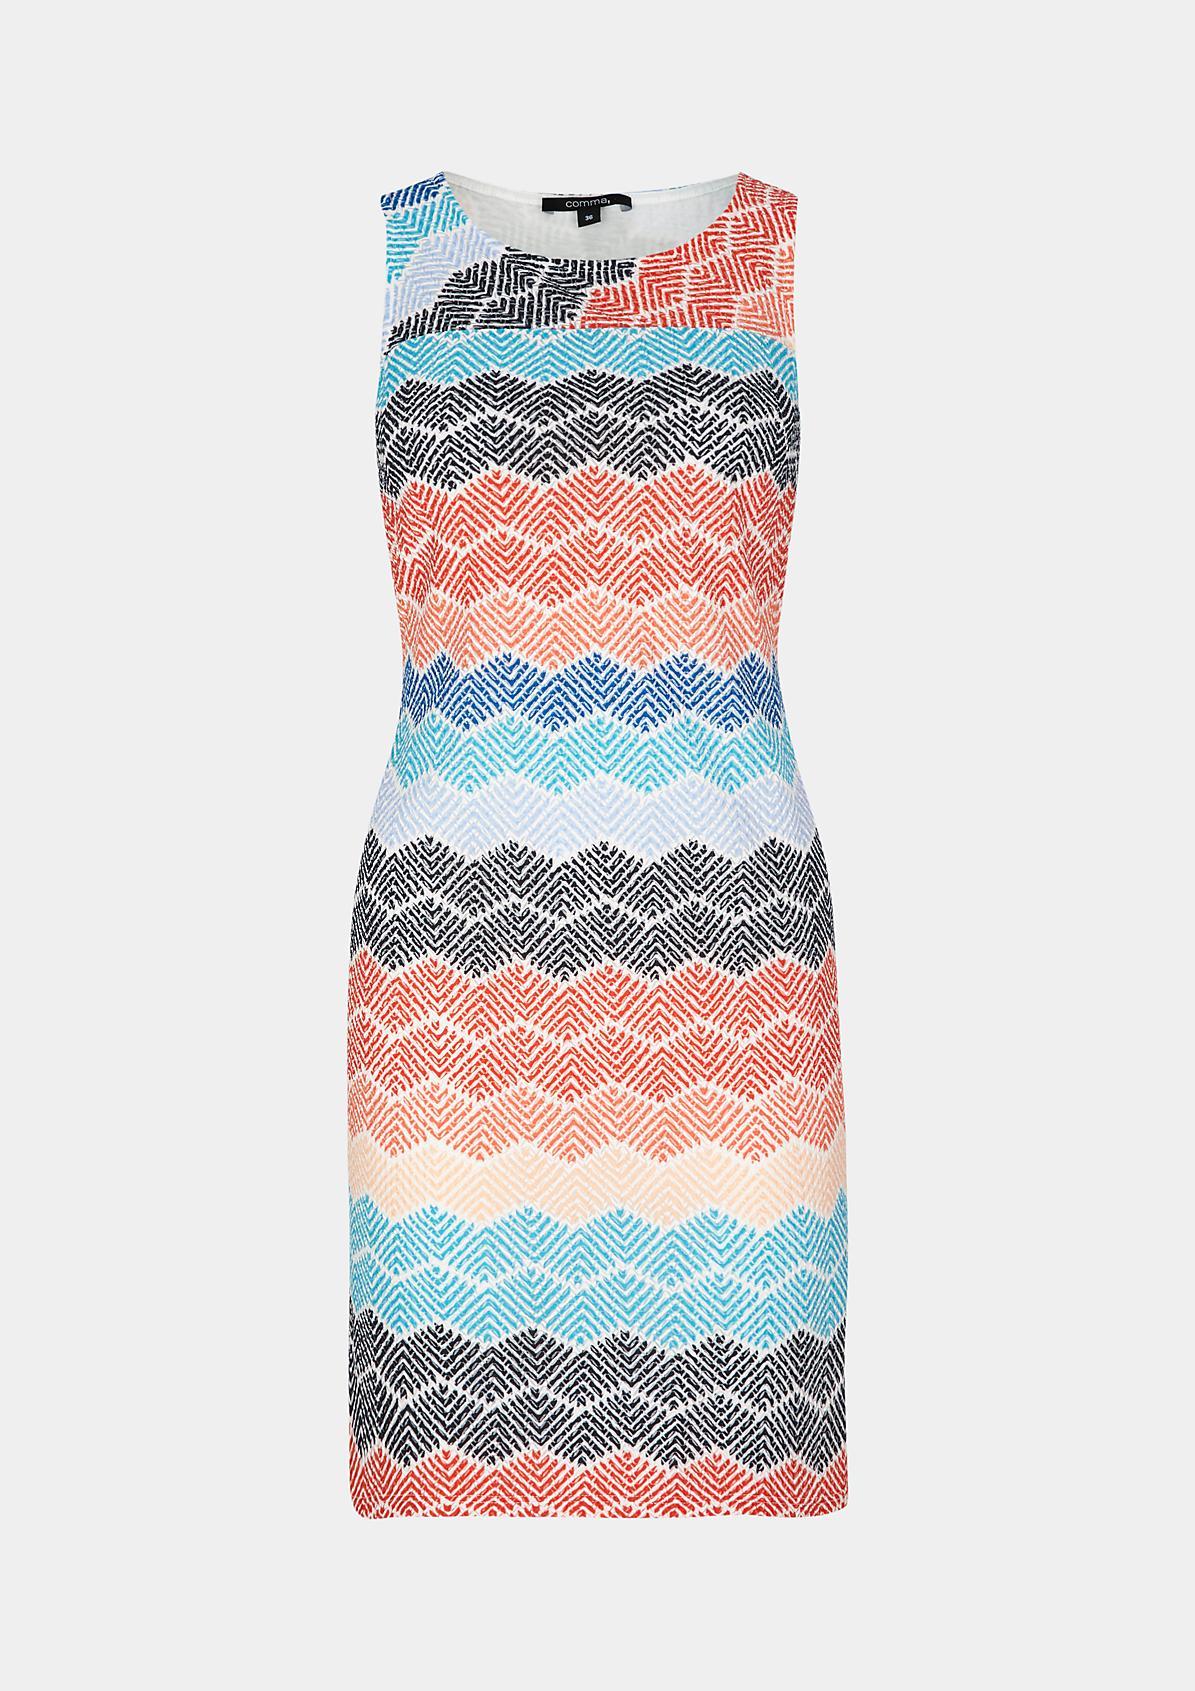 Mesh-Strickkleid mit farbenfrohem Allovermuster